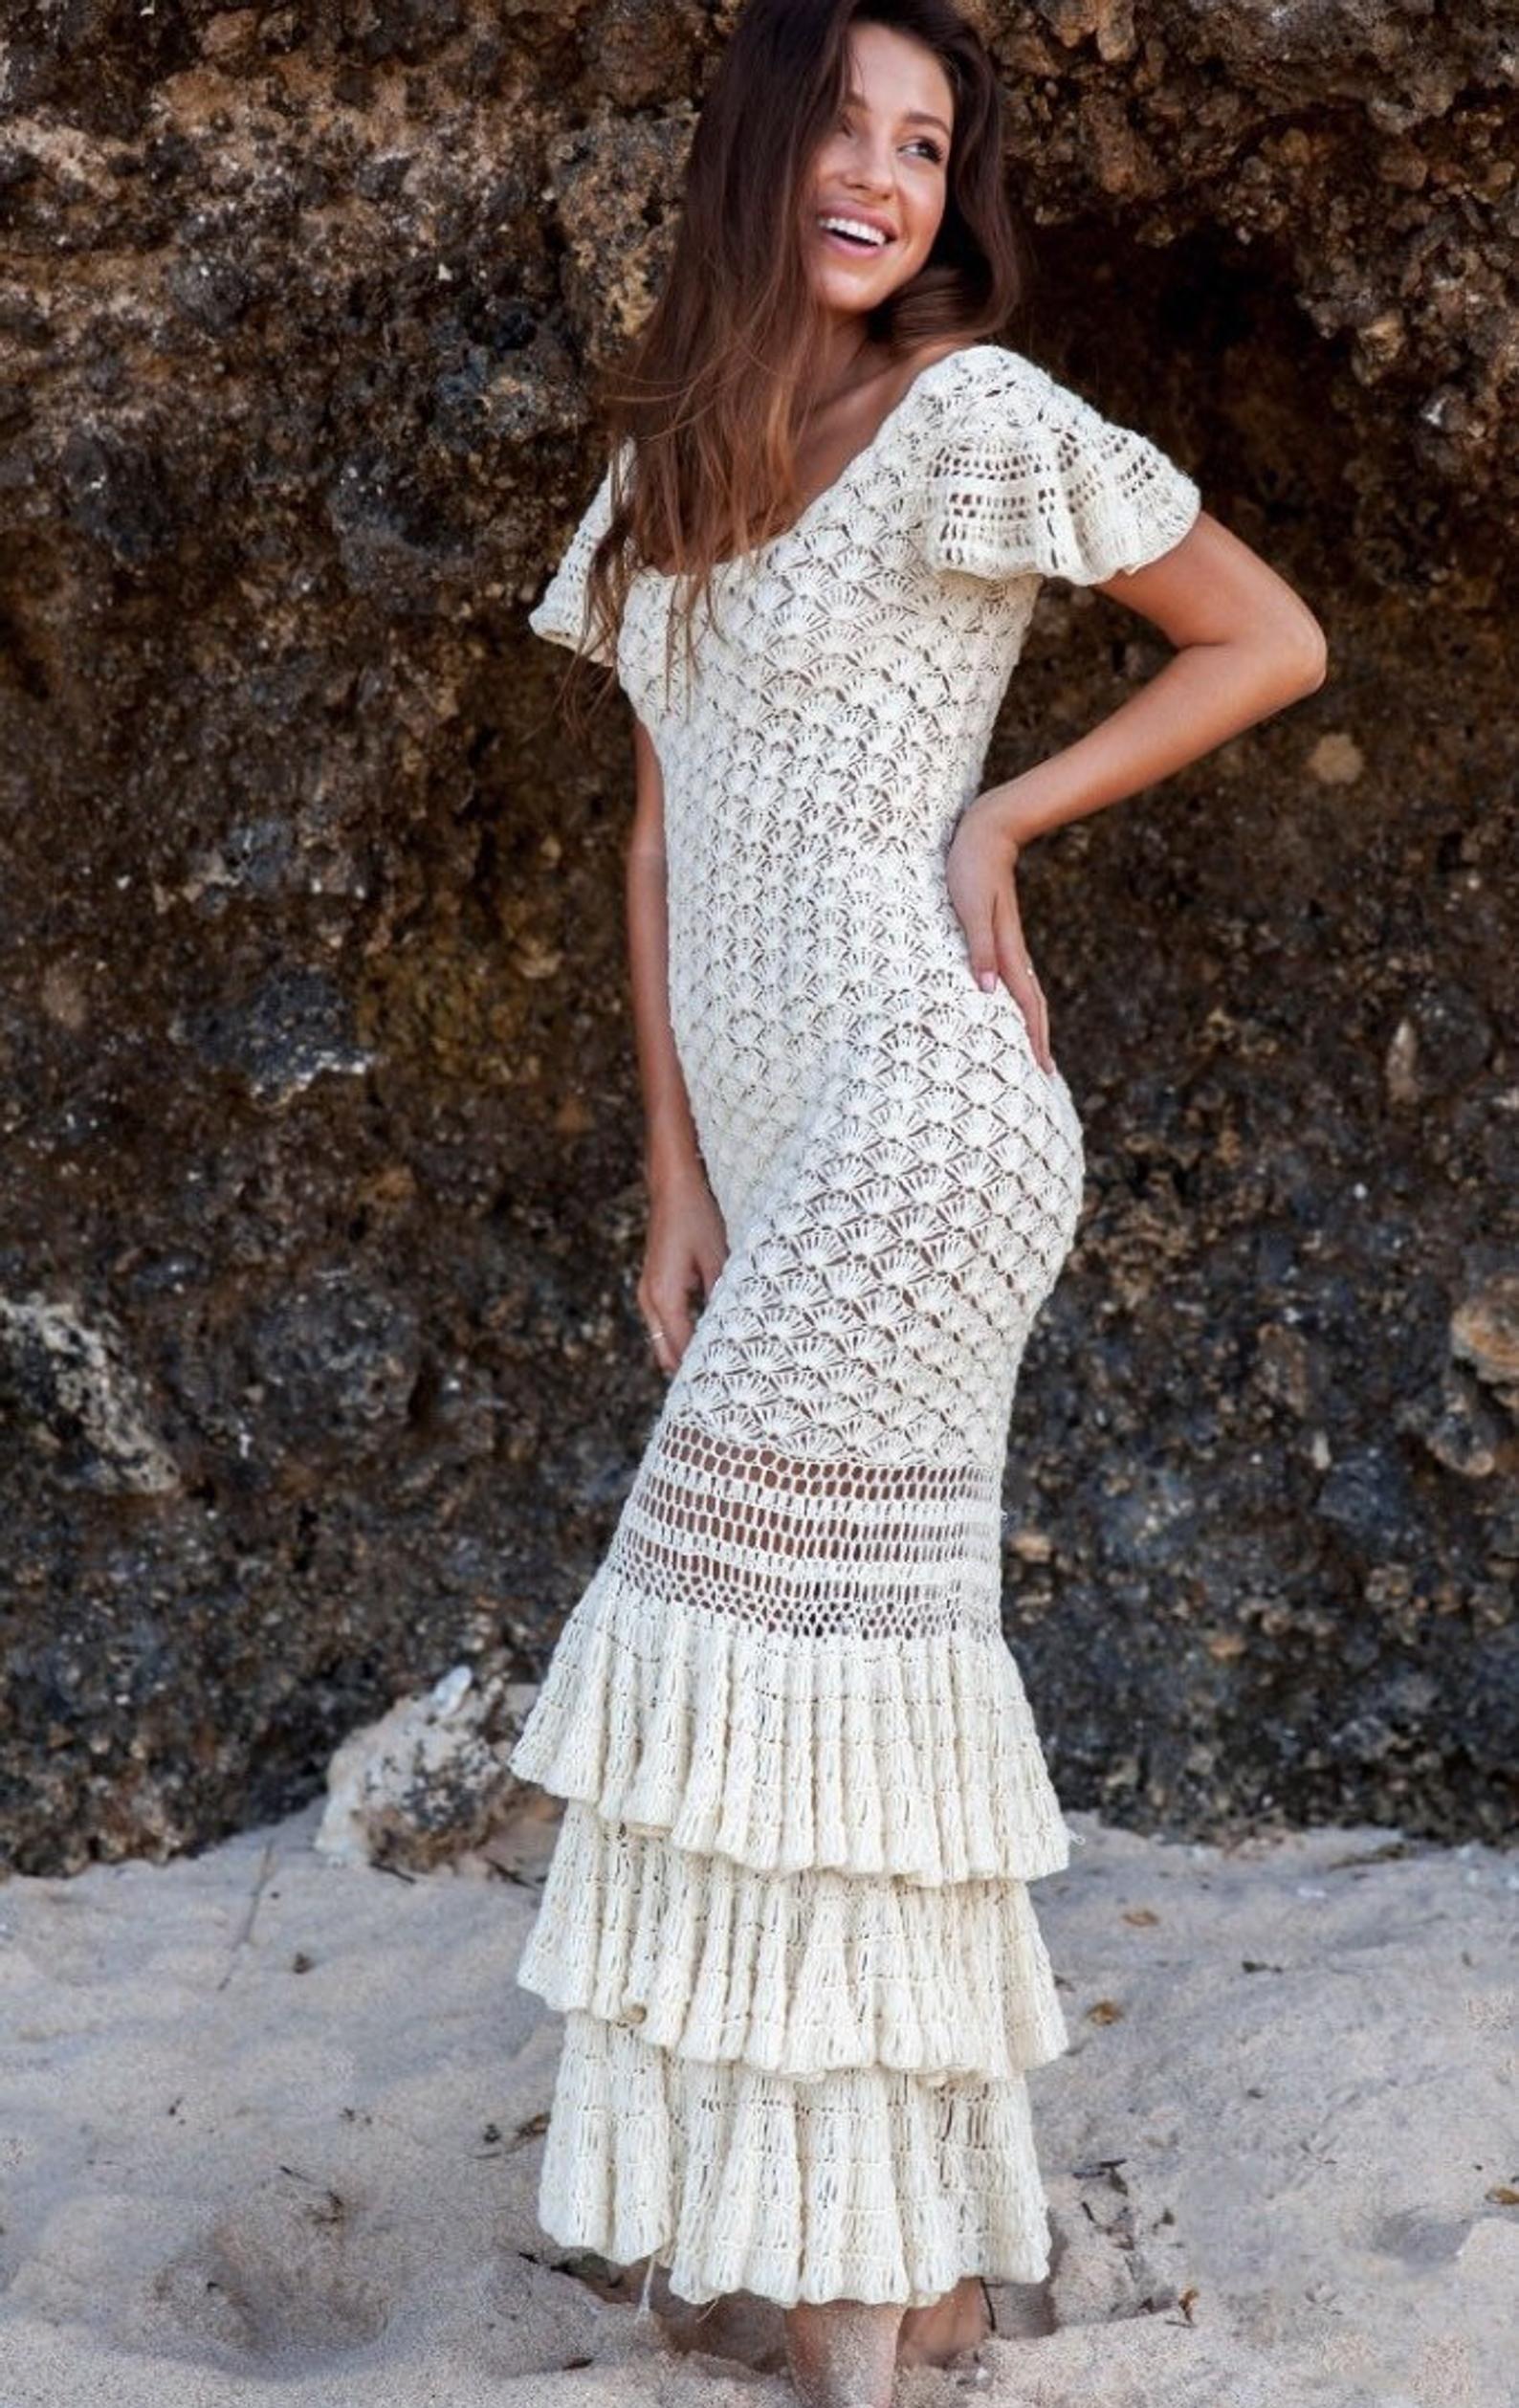 Crochet Mermaid Maxi Ruffles Dress Wedding Dress Evening Etsy Crochet Wedding Dresses Crochet Short Dresses Crochet Dress Pattern [ 2517 x 1588 Pixel ]